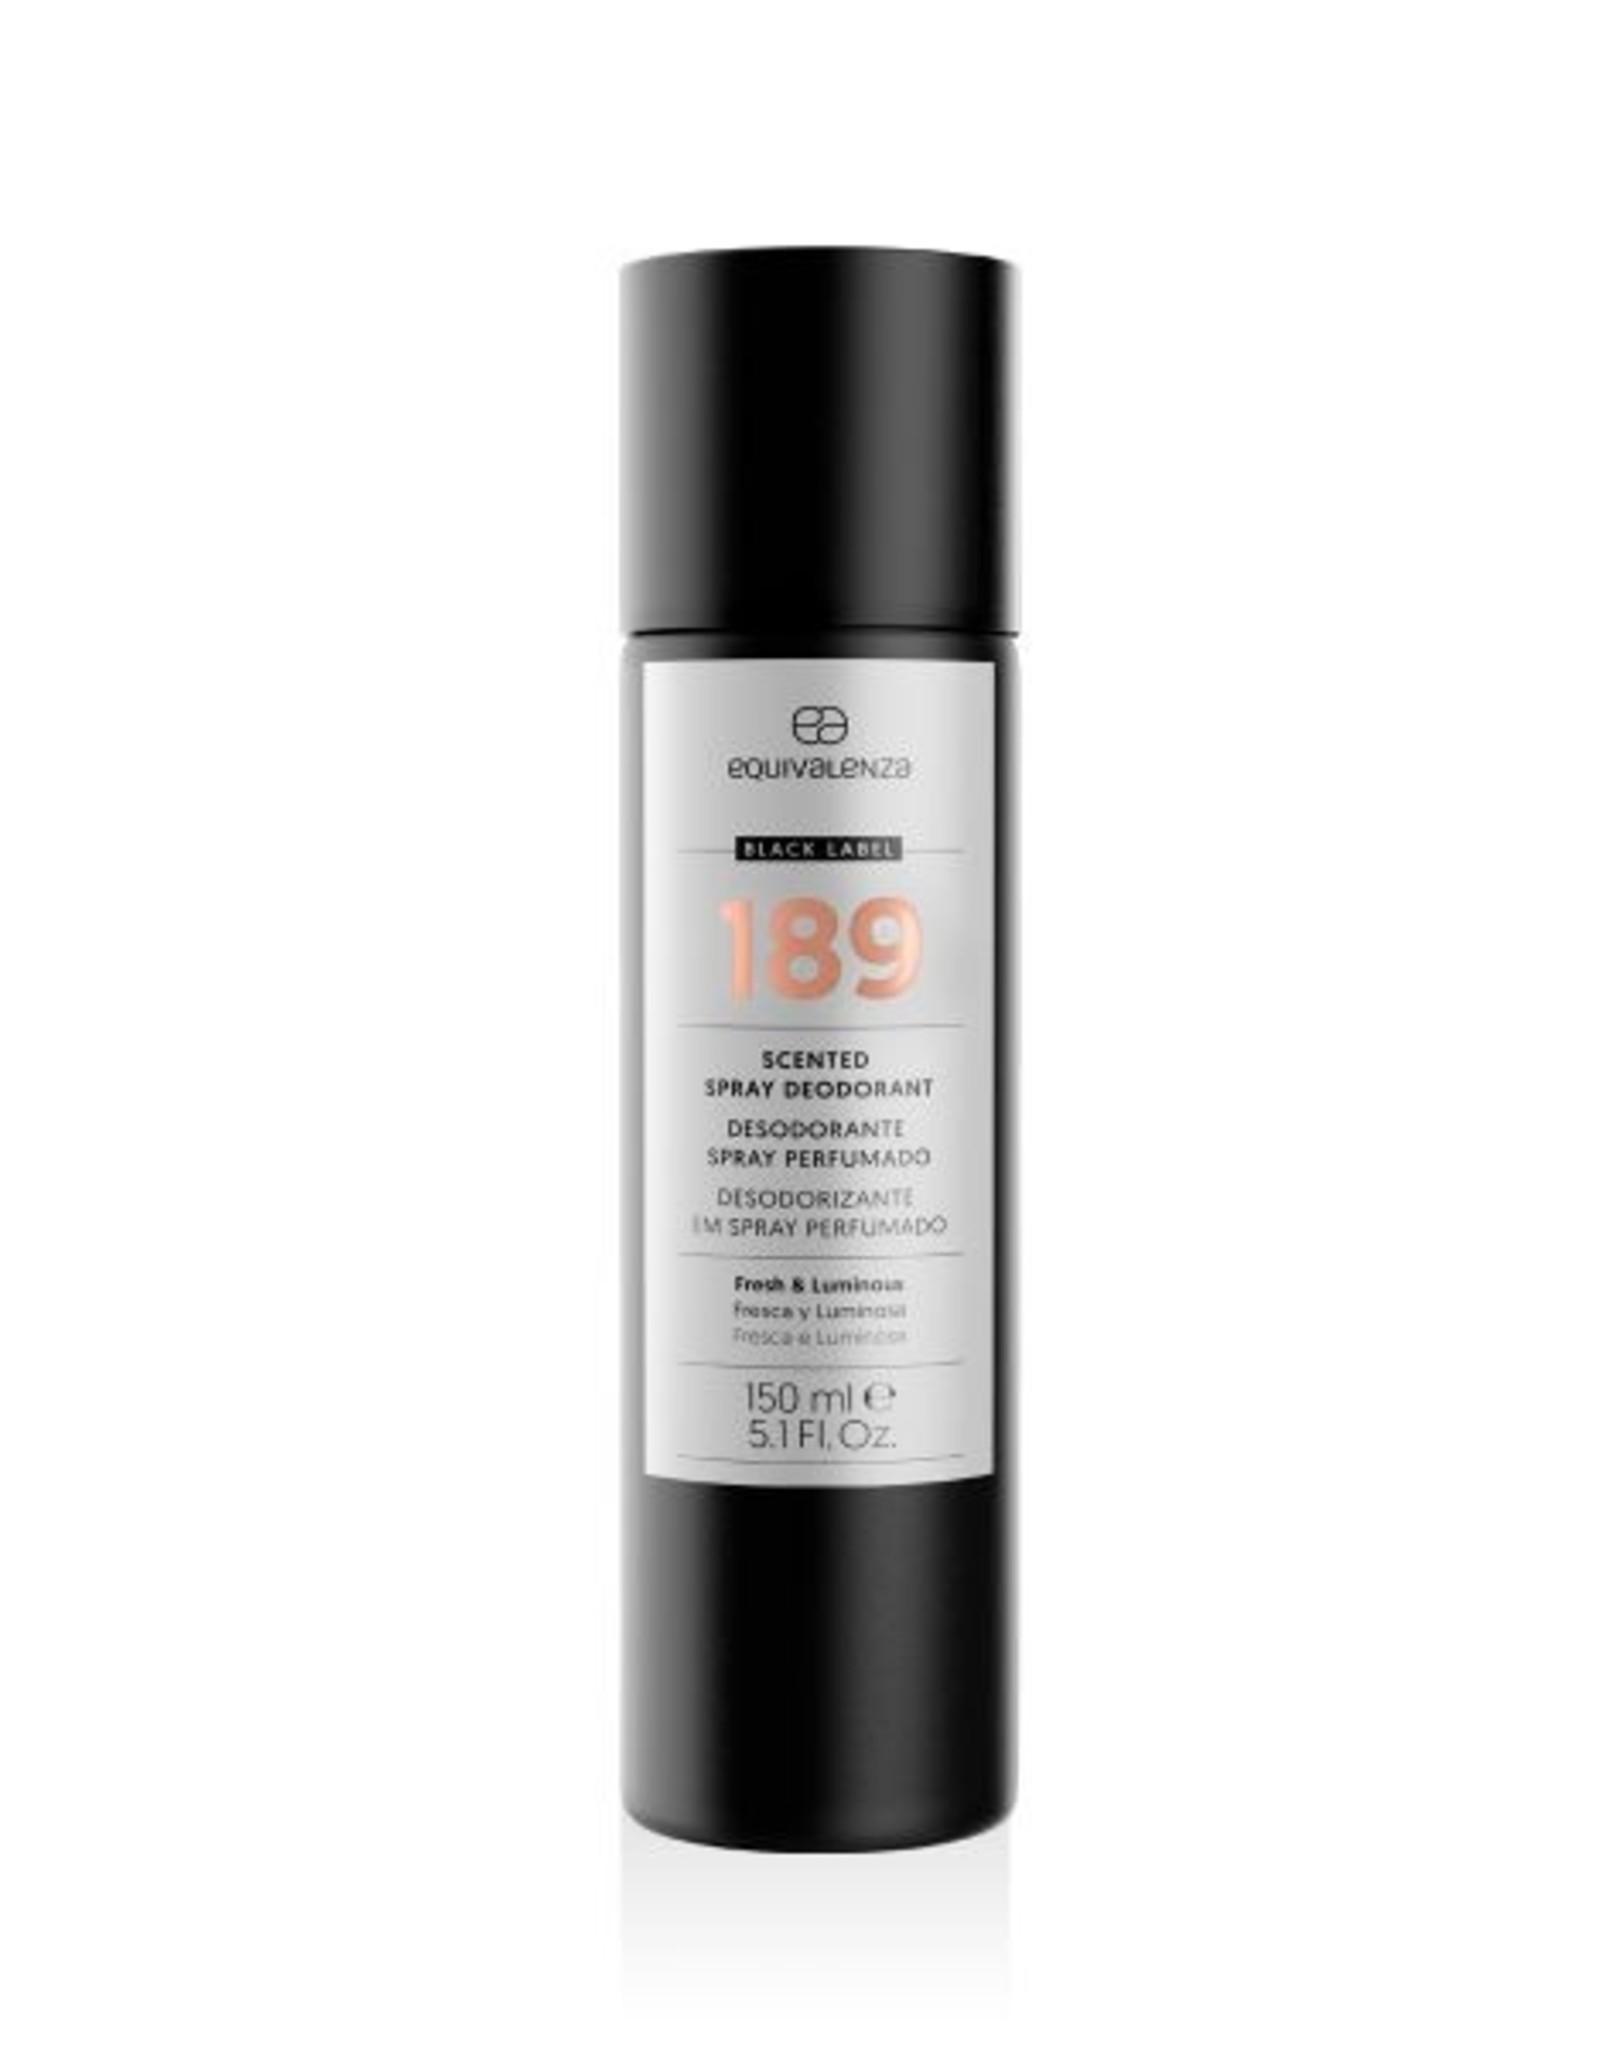 Equivalenza Black Label Deodorant 189